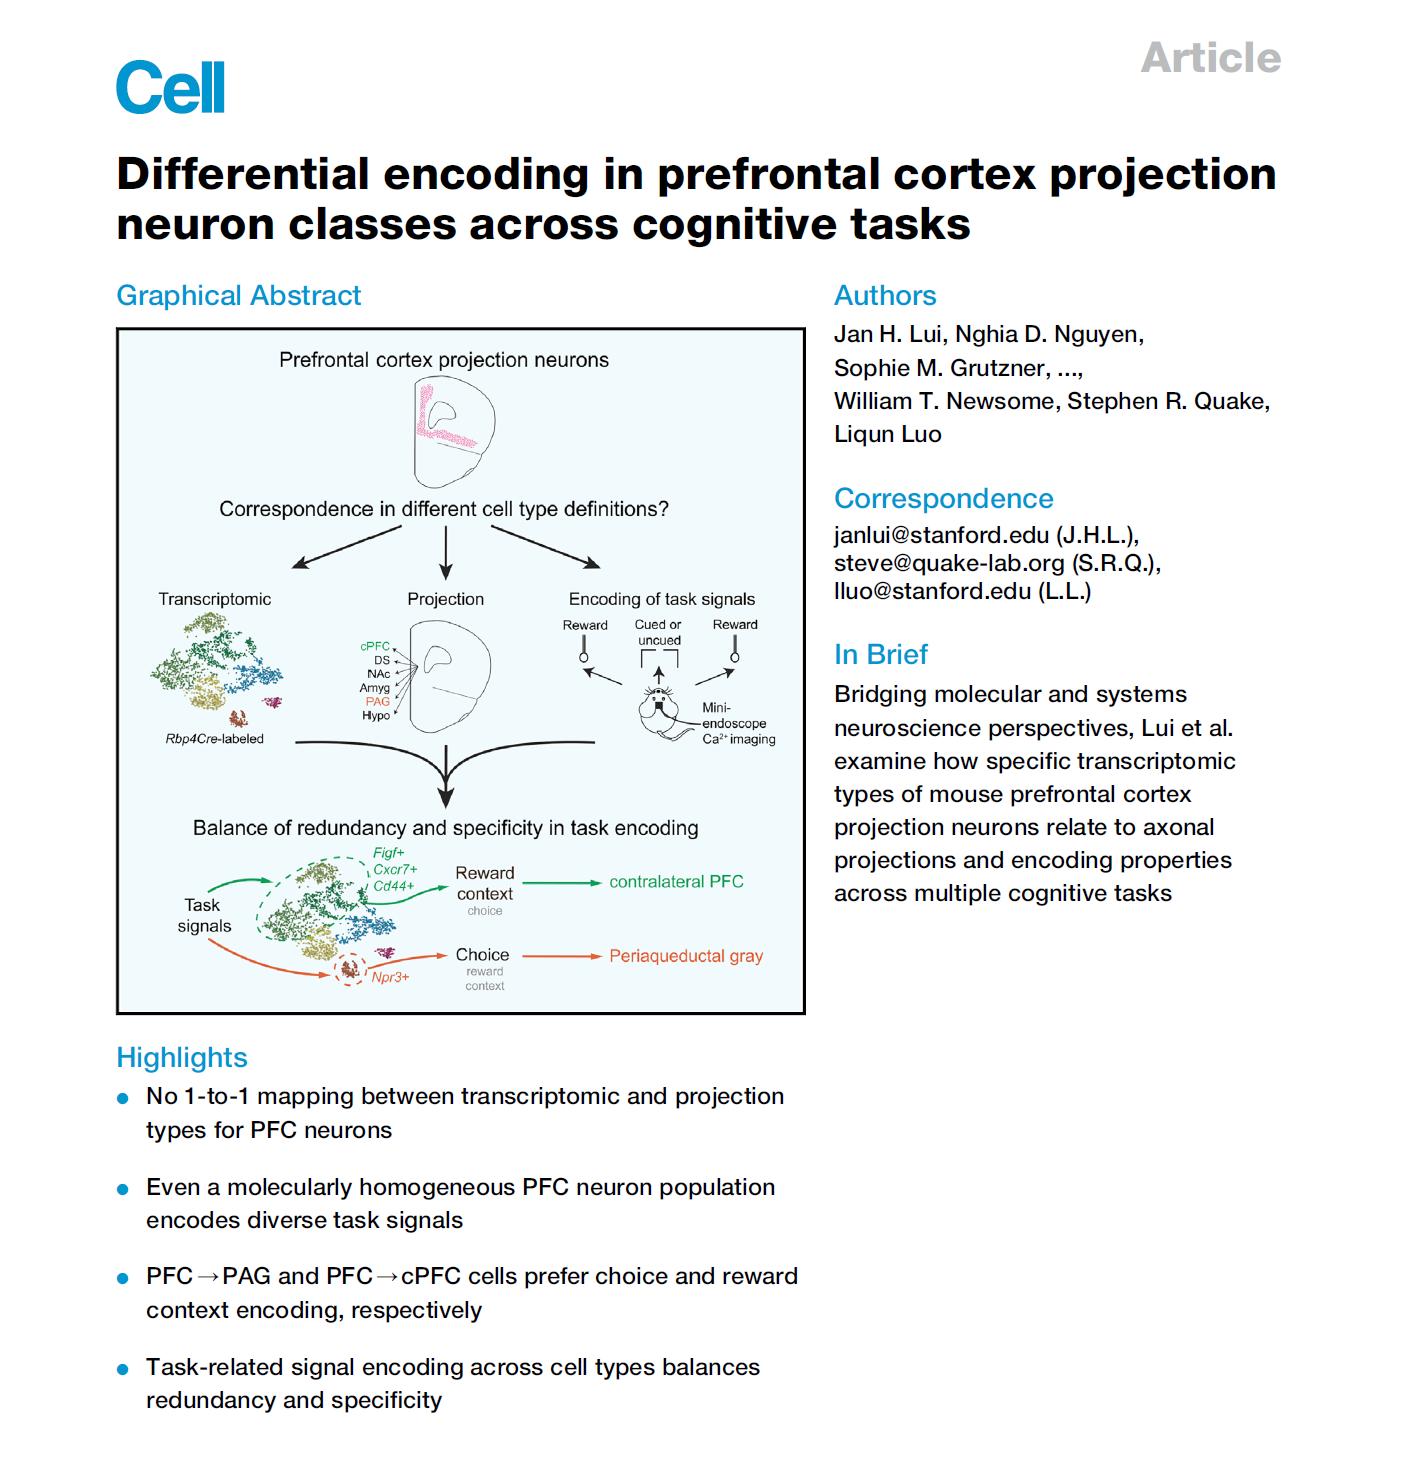 【Inscopix文章】骆利群CELL新作: 不同神经元类型和编码认知行为的关系